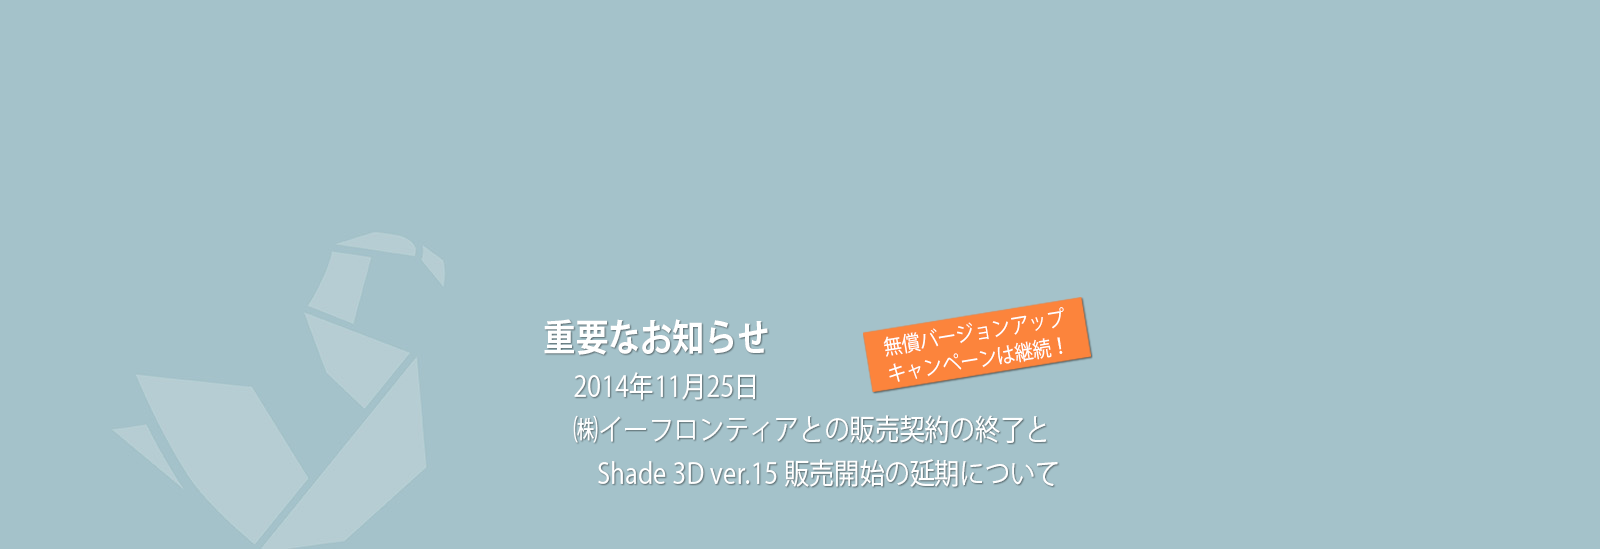 shade3d 公式 shade 3d ver 15シリーズ発売及び無償アップグレード終了